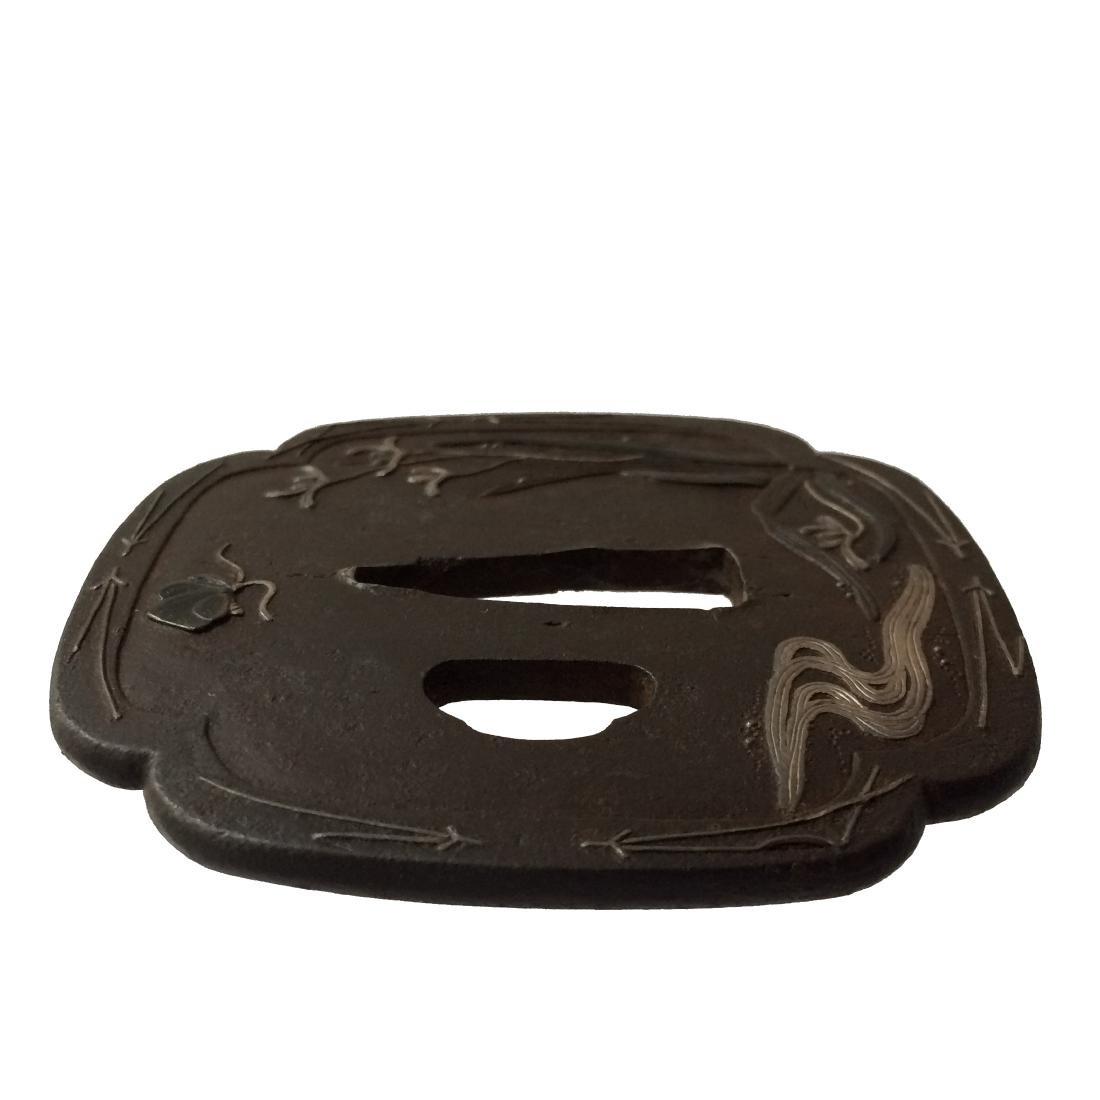 Iron tsuba with silver and shakudo inlay - 3